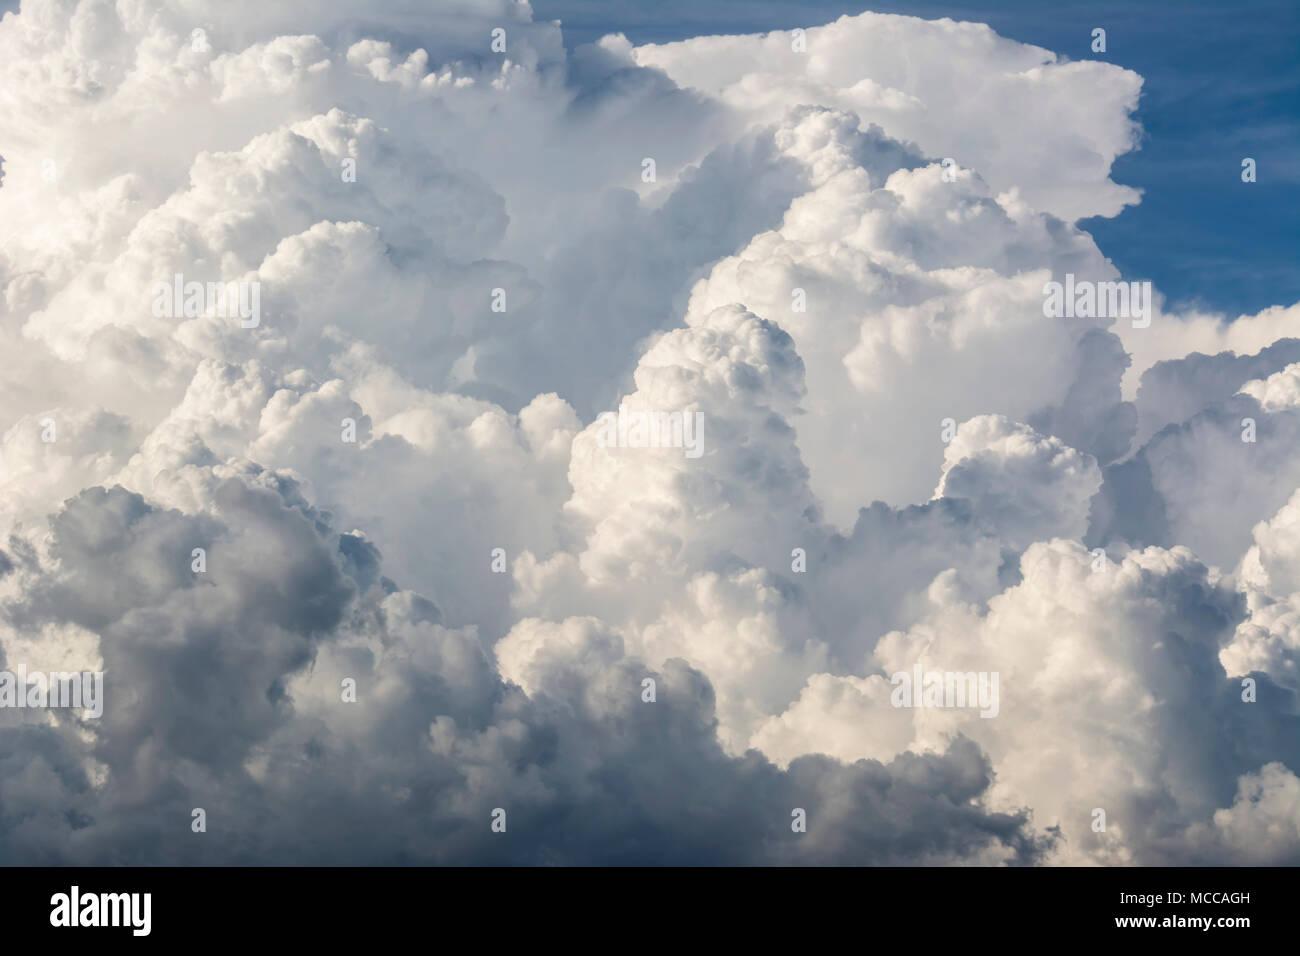 Clouds storm, cumulonimbus clouds, Rapid vertical growth mature thunderstorm - Stock Image